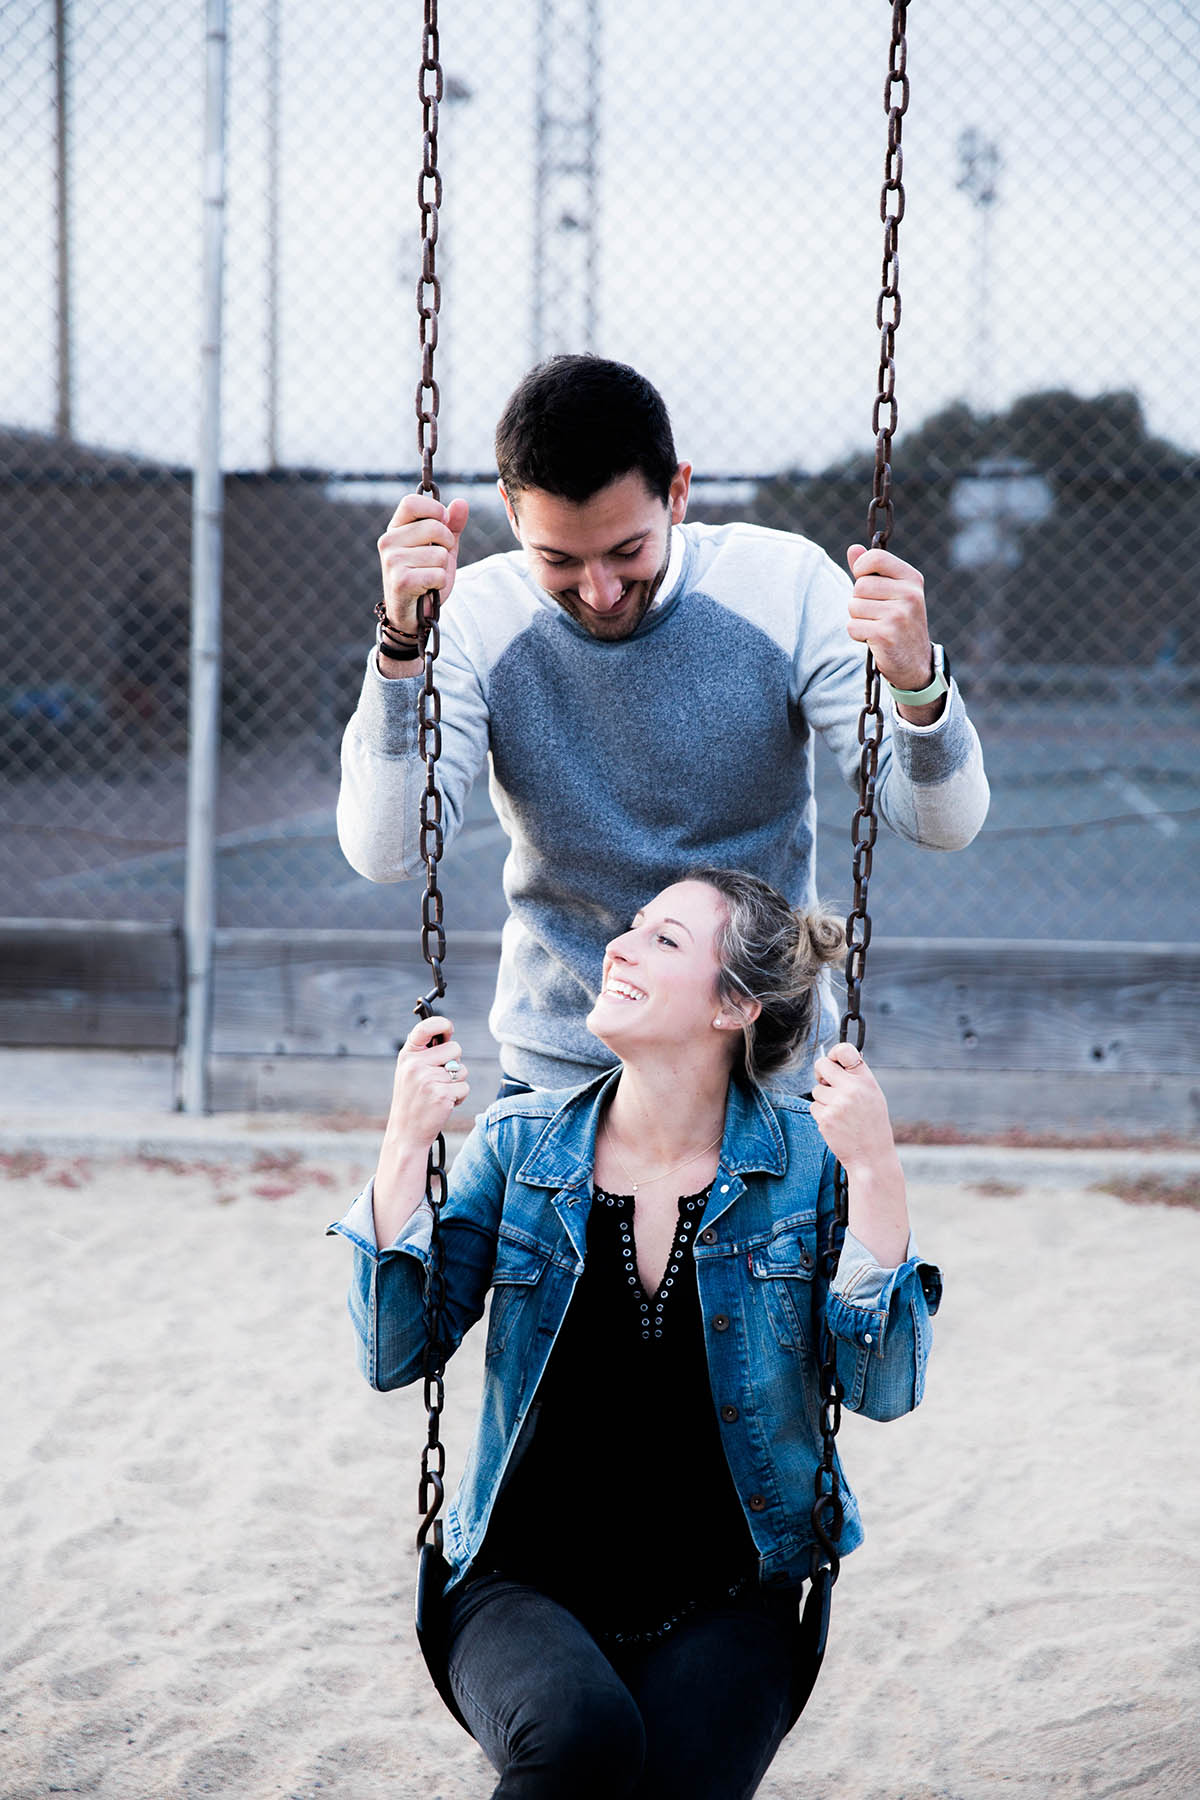 Amanda Holstein young couple on the swings